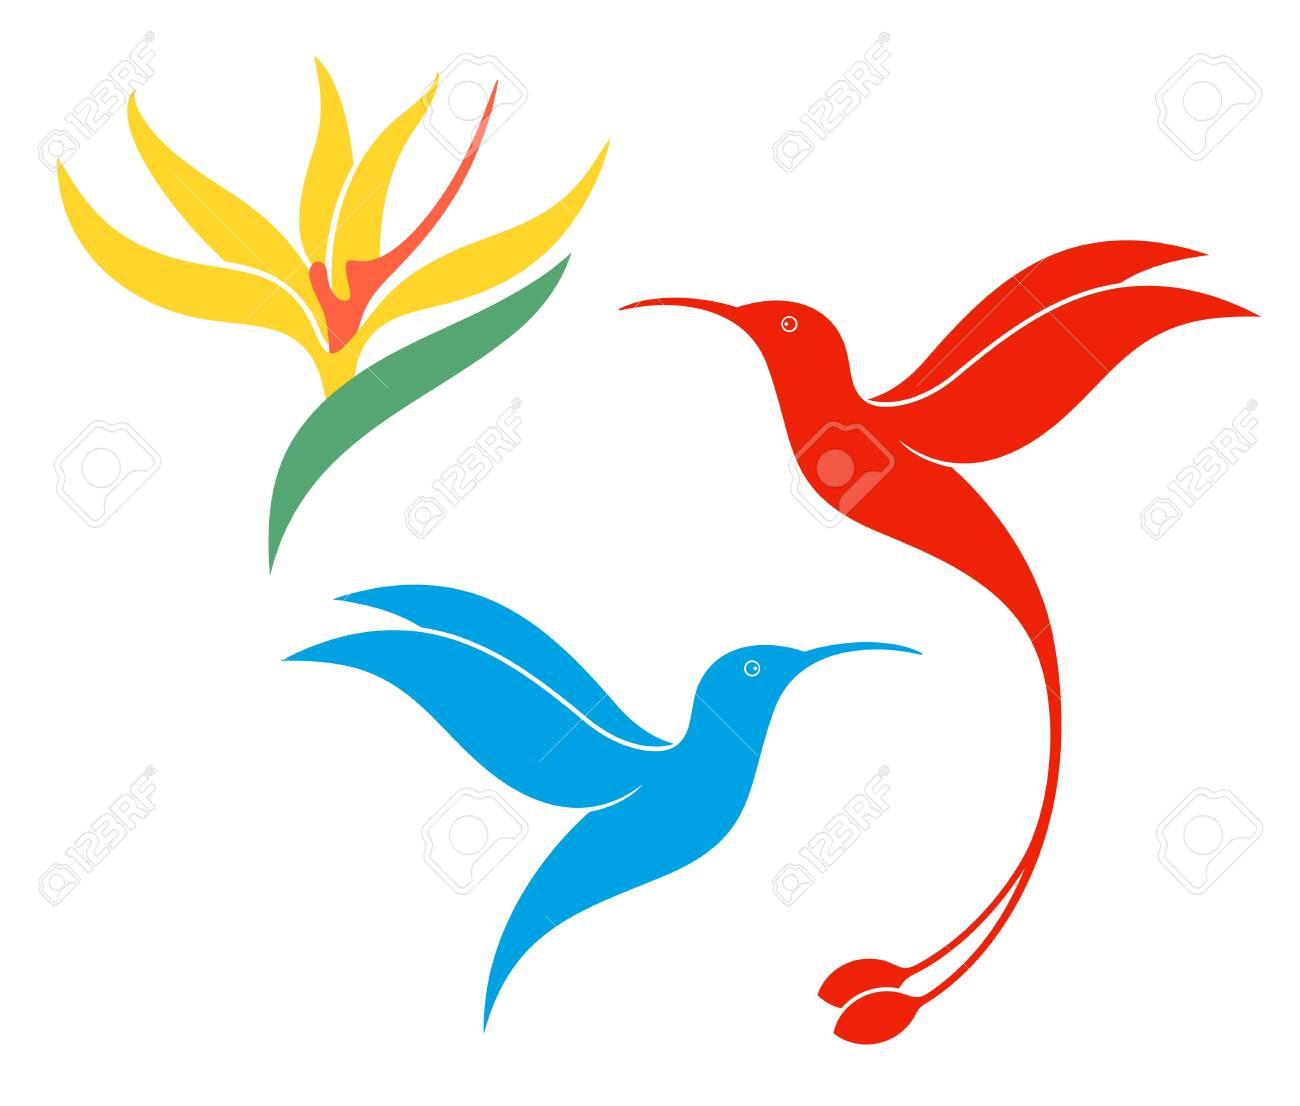 Hummingbird logo. Isolated hummingbird on white background - 134470660